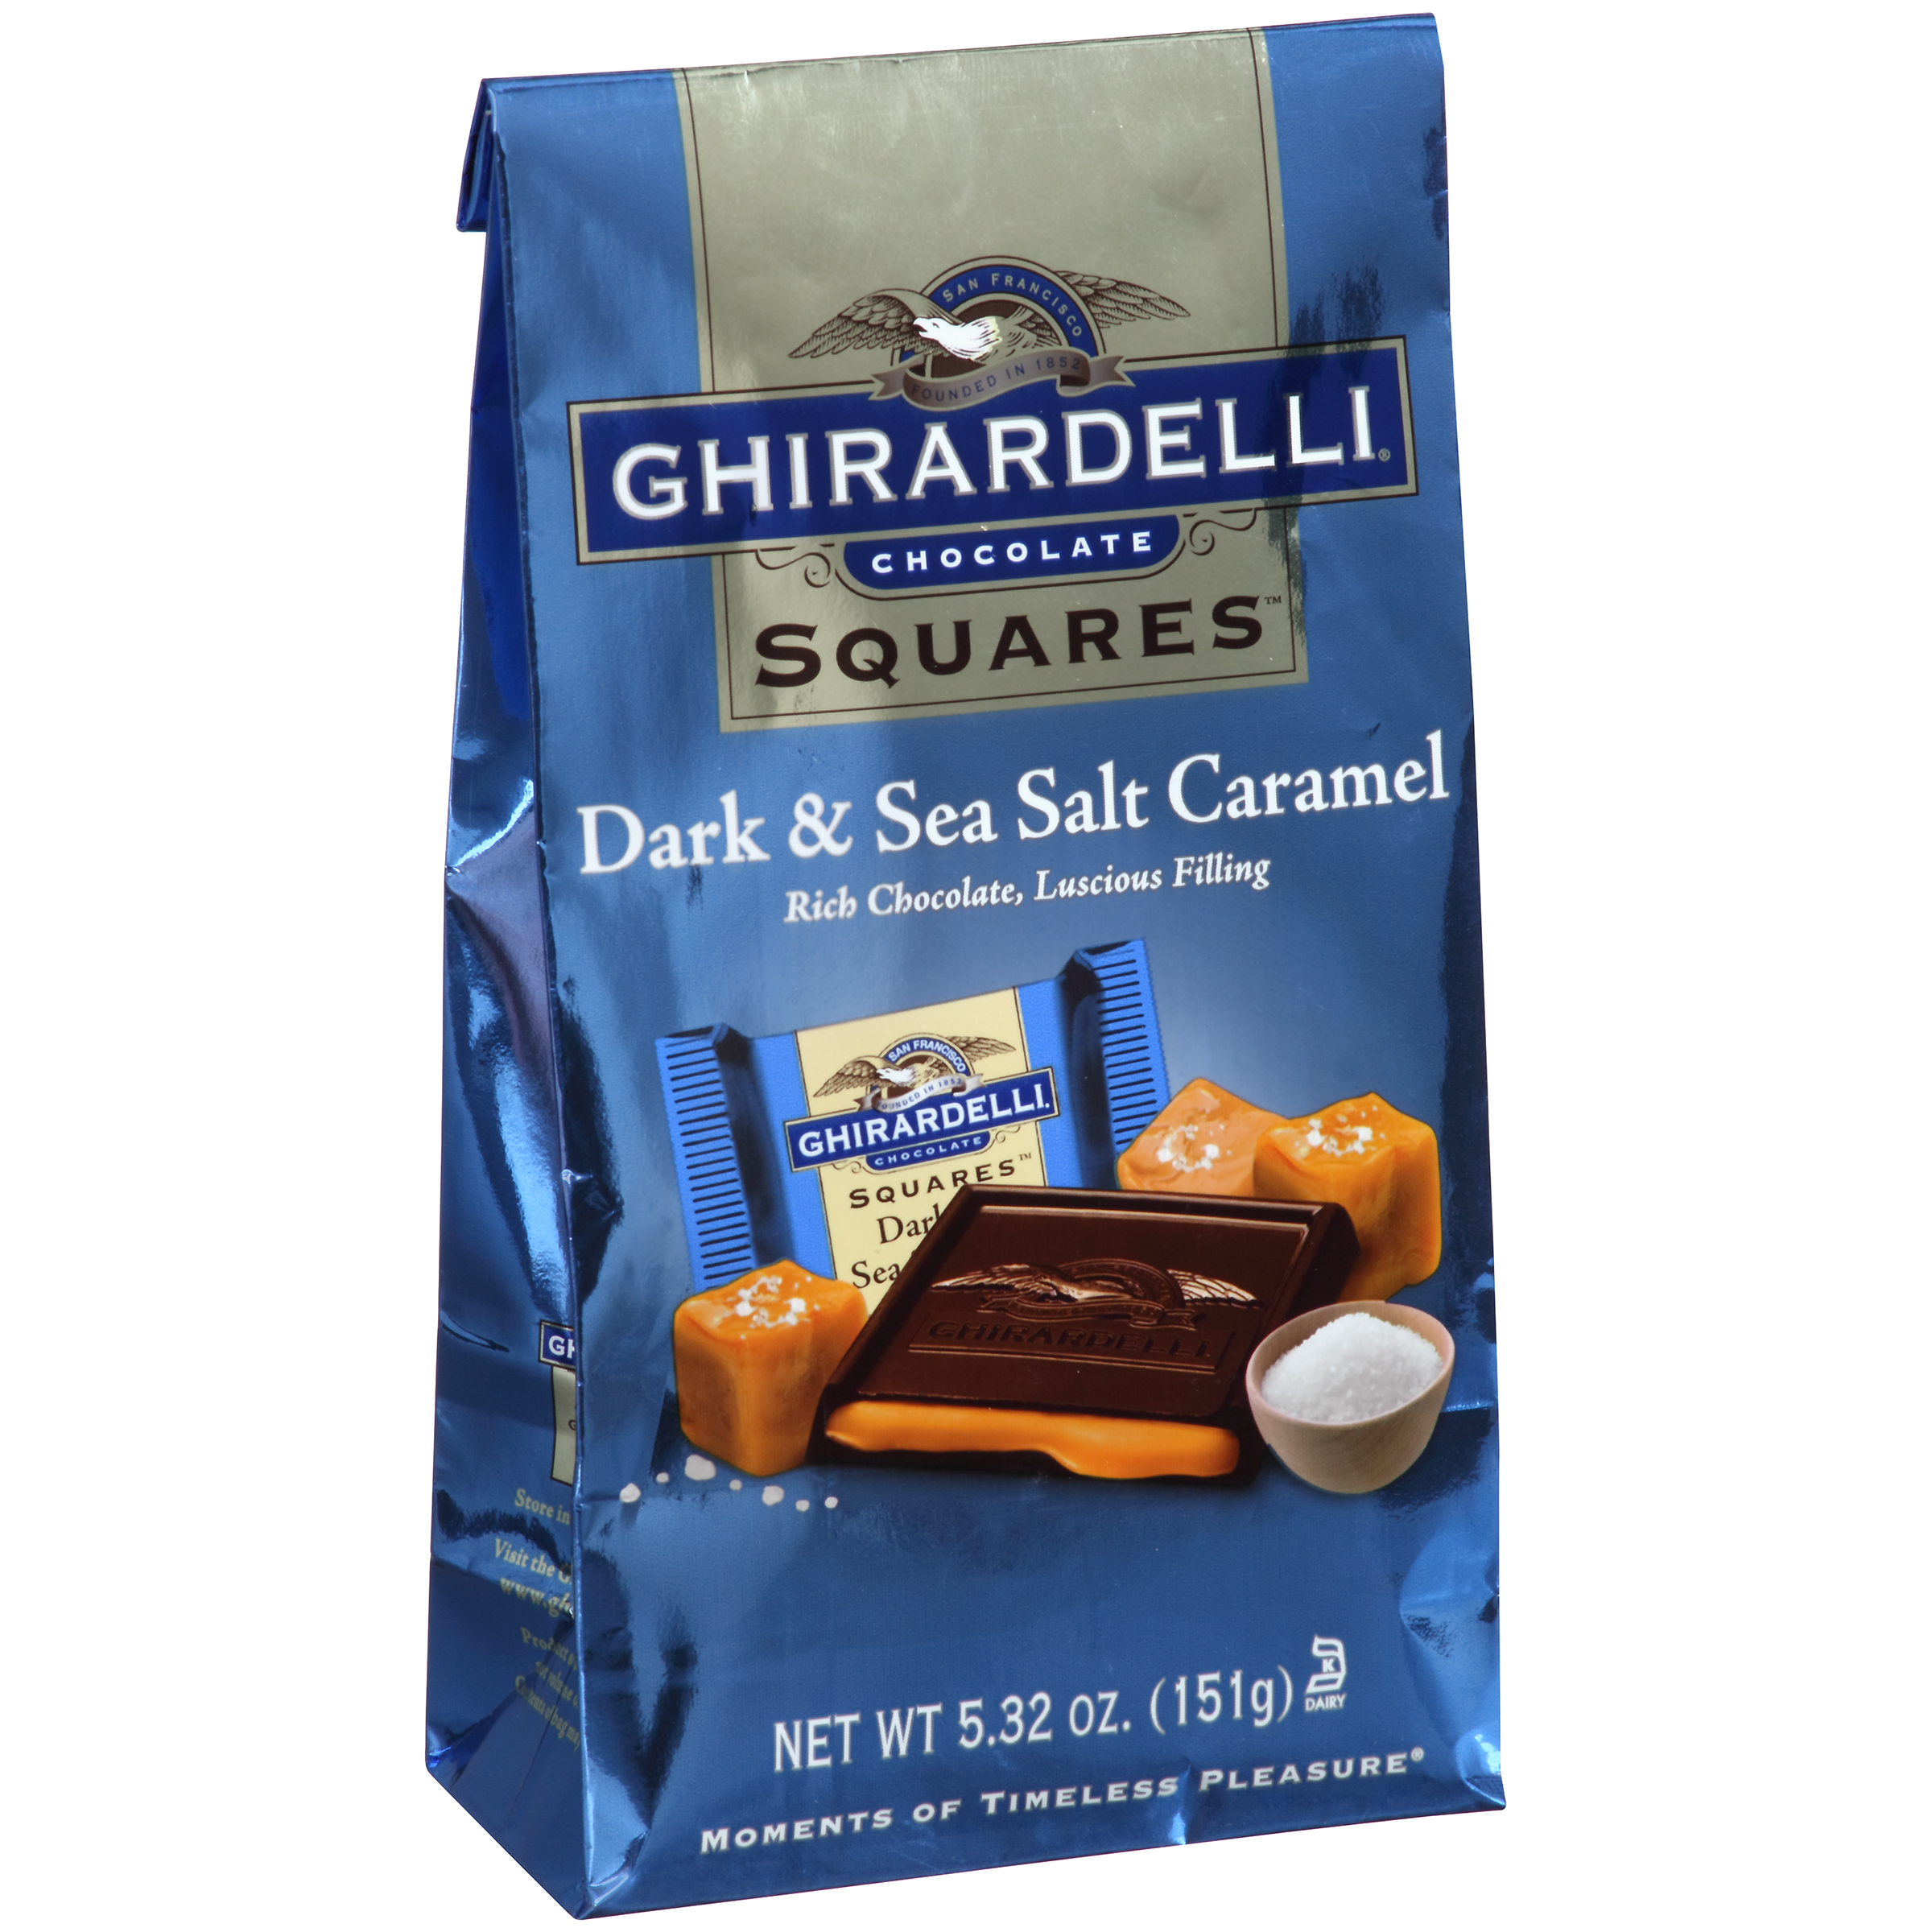 Ghirardelli Premium Chocolate Assortment, 4.25 OZ - Walmart.com